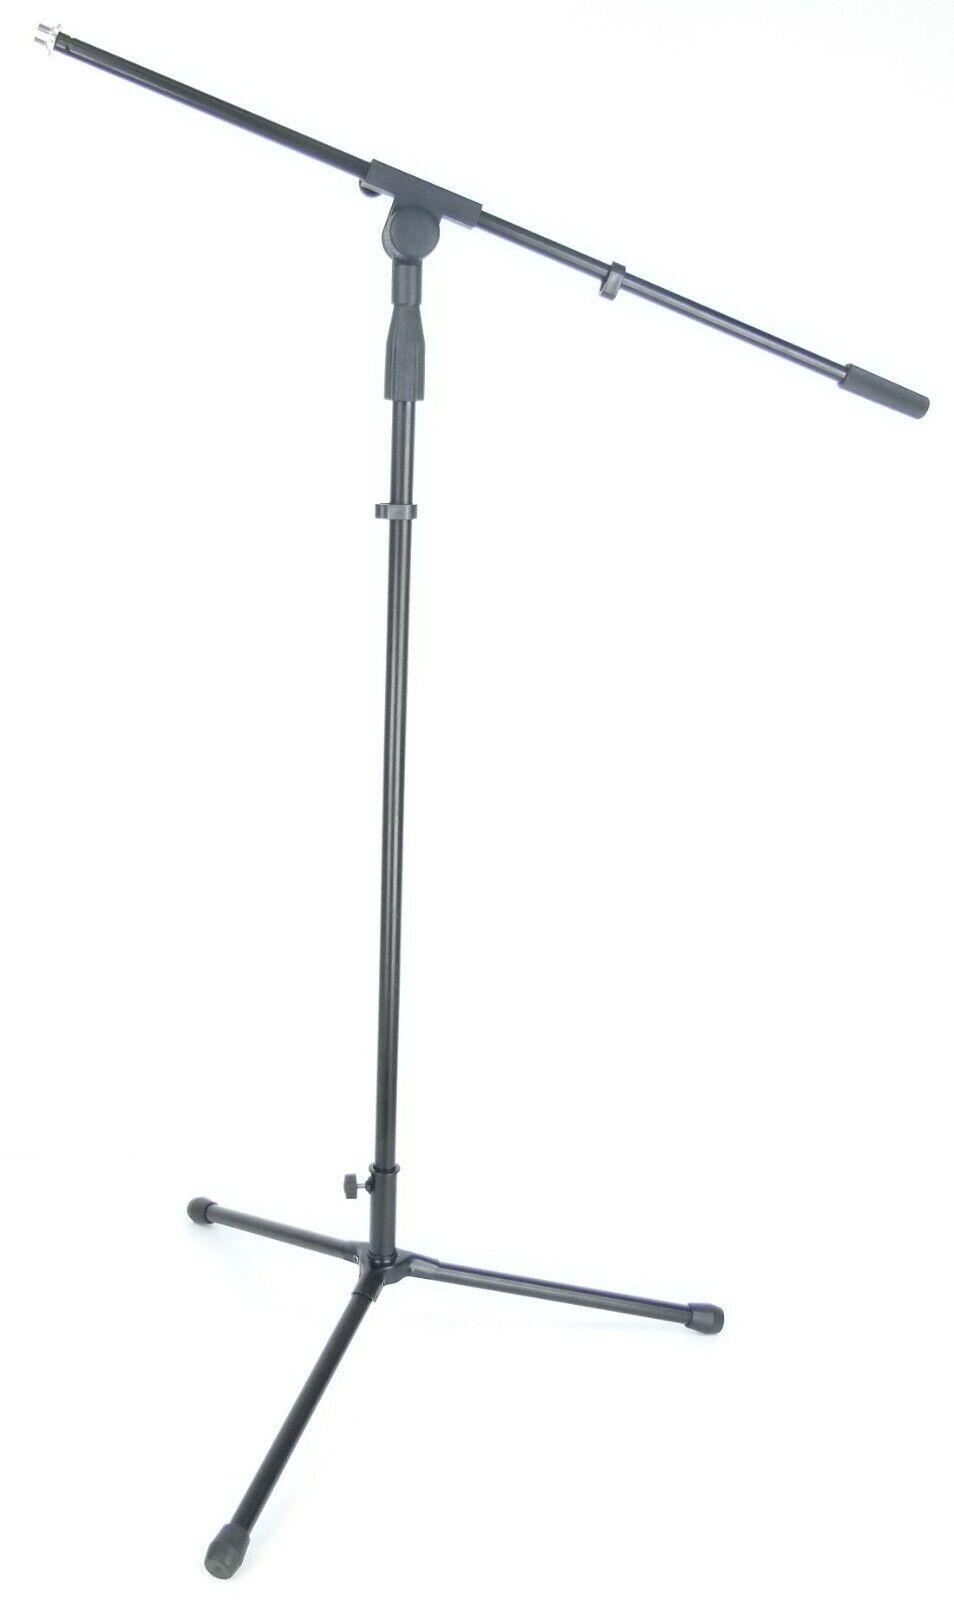 S22B MIC STAND MICROPHONE TRIPOD M. Gallows Arm Microphone Tripod Stand